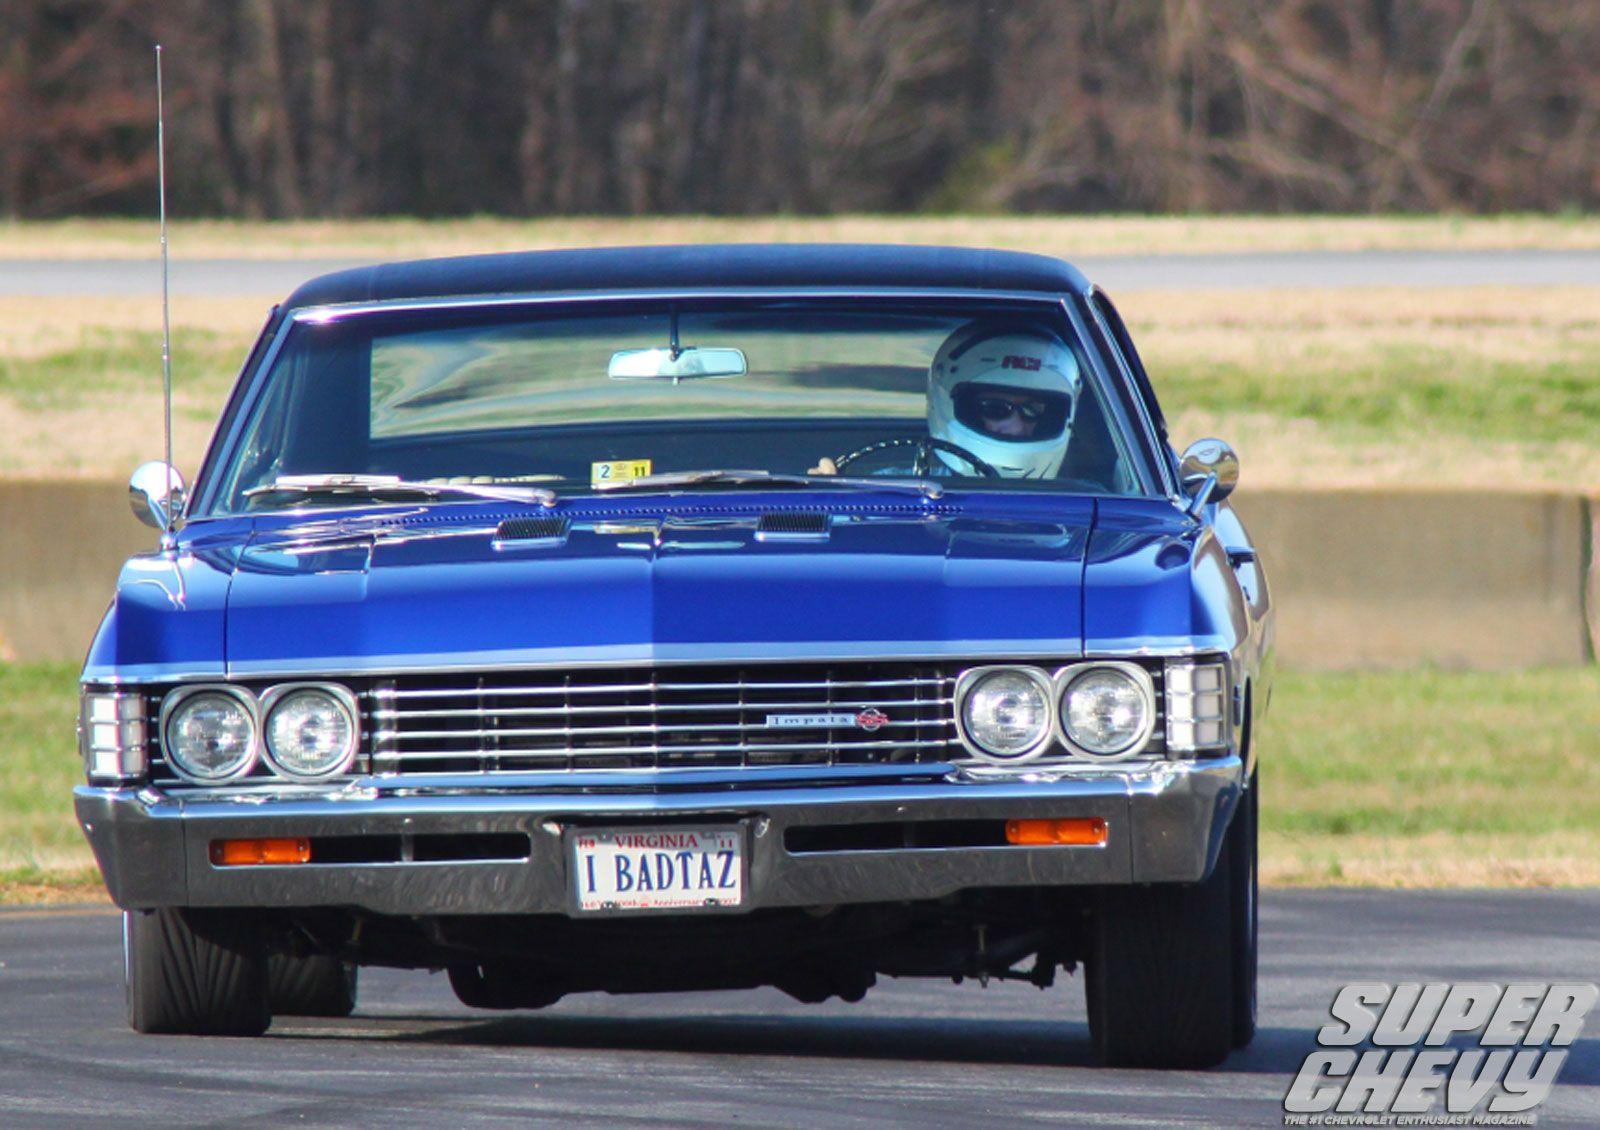 1967 chevrolet impala sucp 1108 08 1967 chevrolet impala